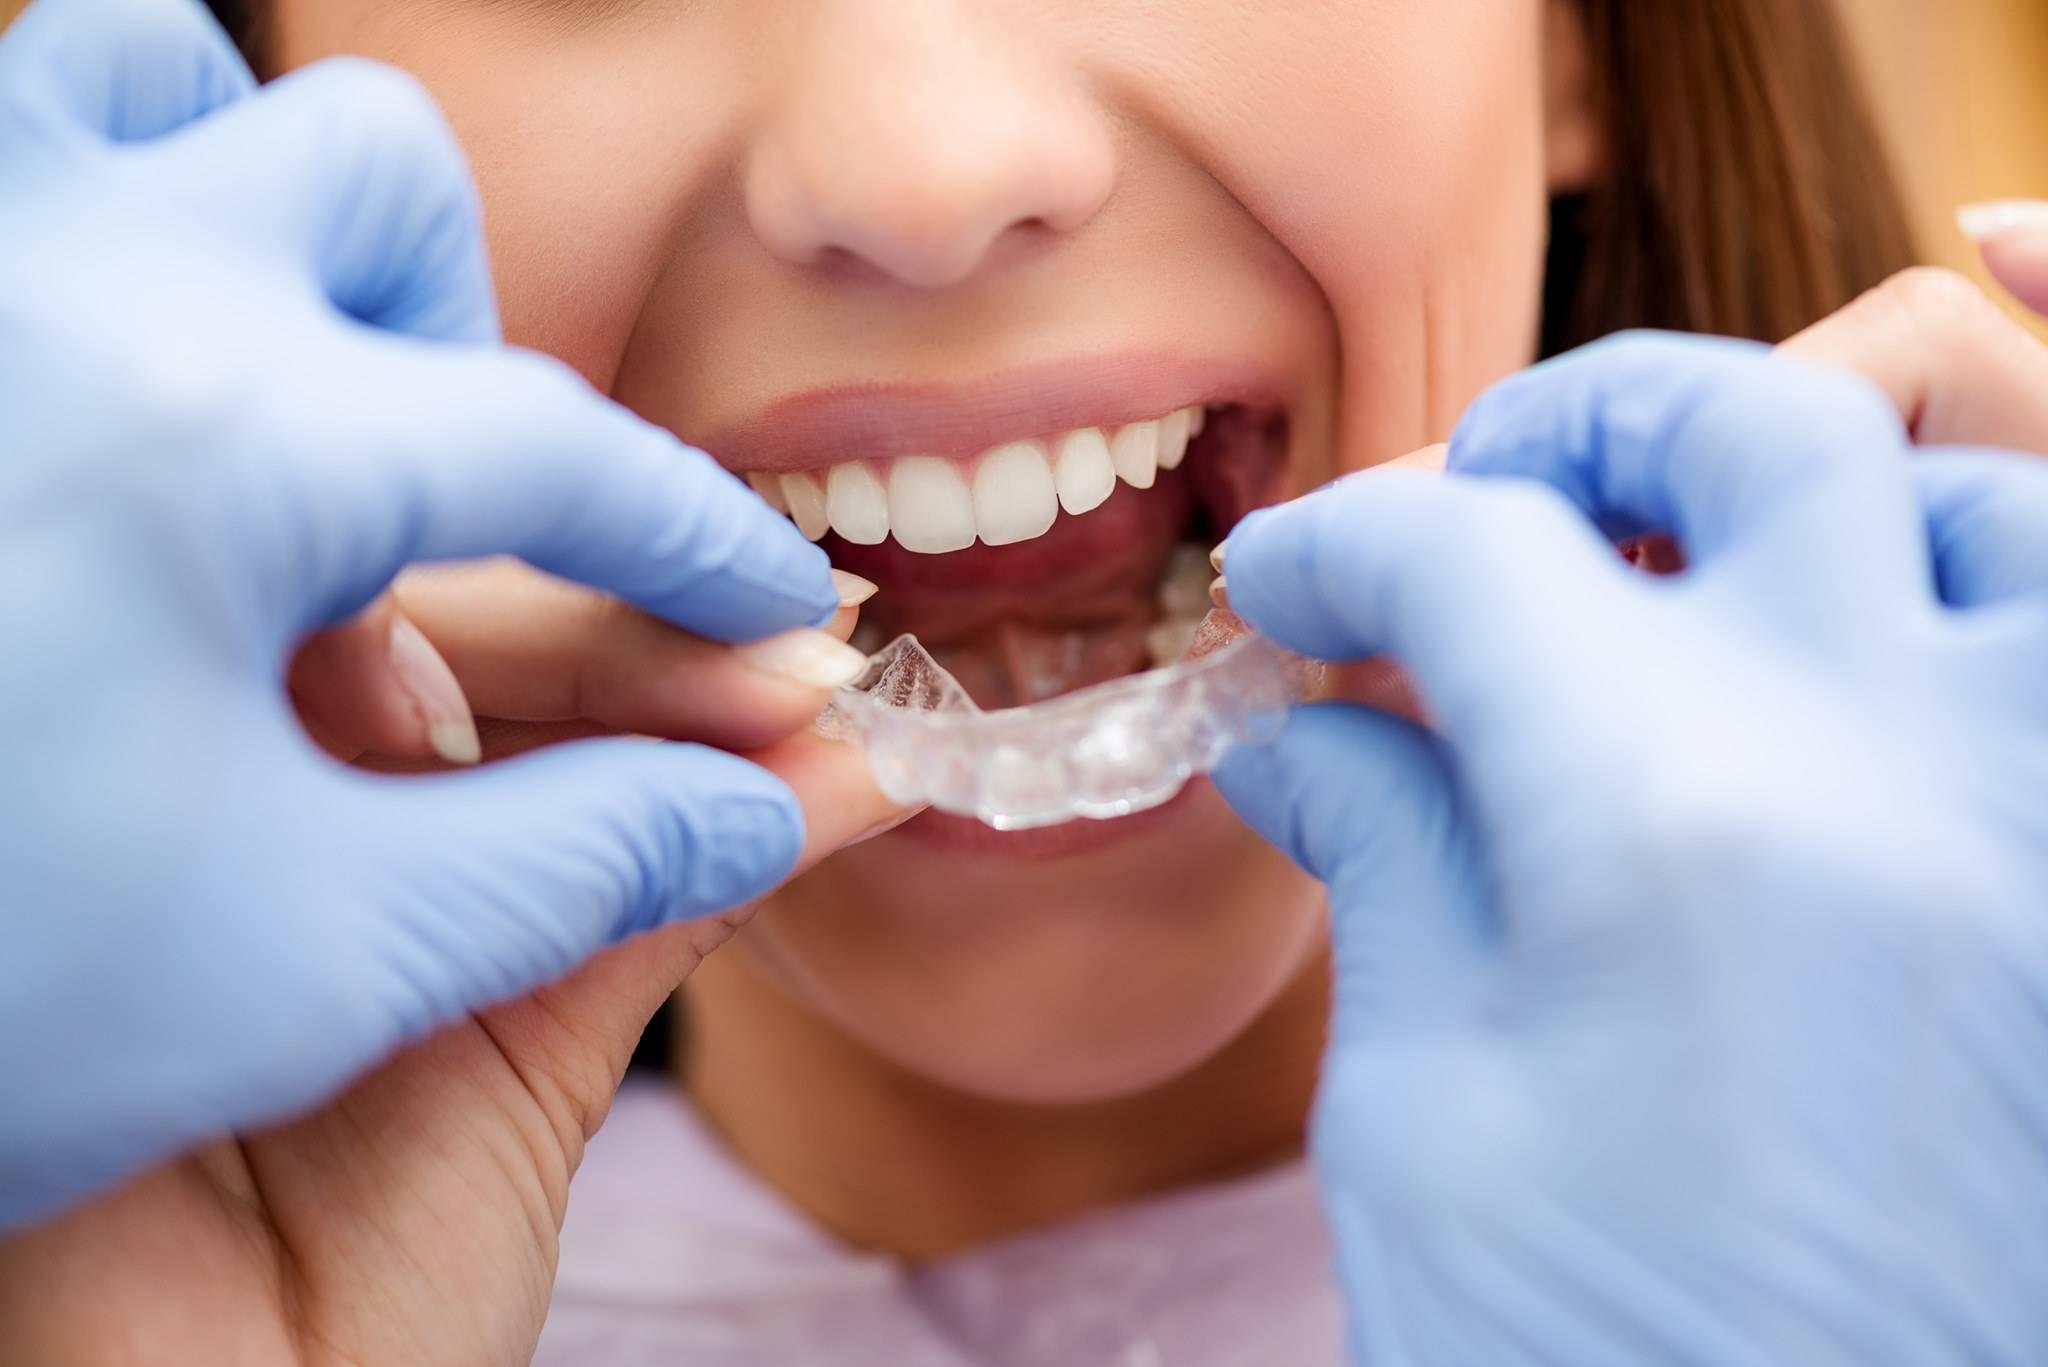 Simply Teeth - dentist  | Photo 3 of 4 | Address: 438 Green Ln, Ilford IG3 9LD, UK | Phone: +44 20 8590 0575